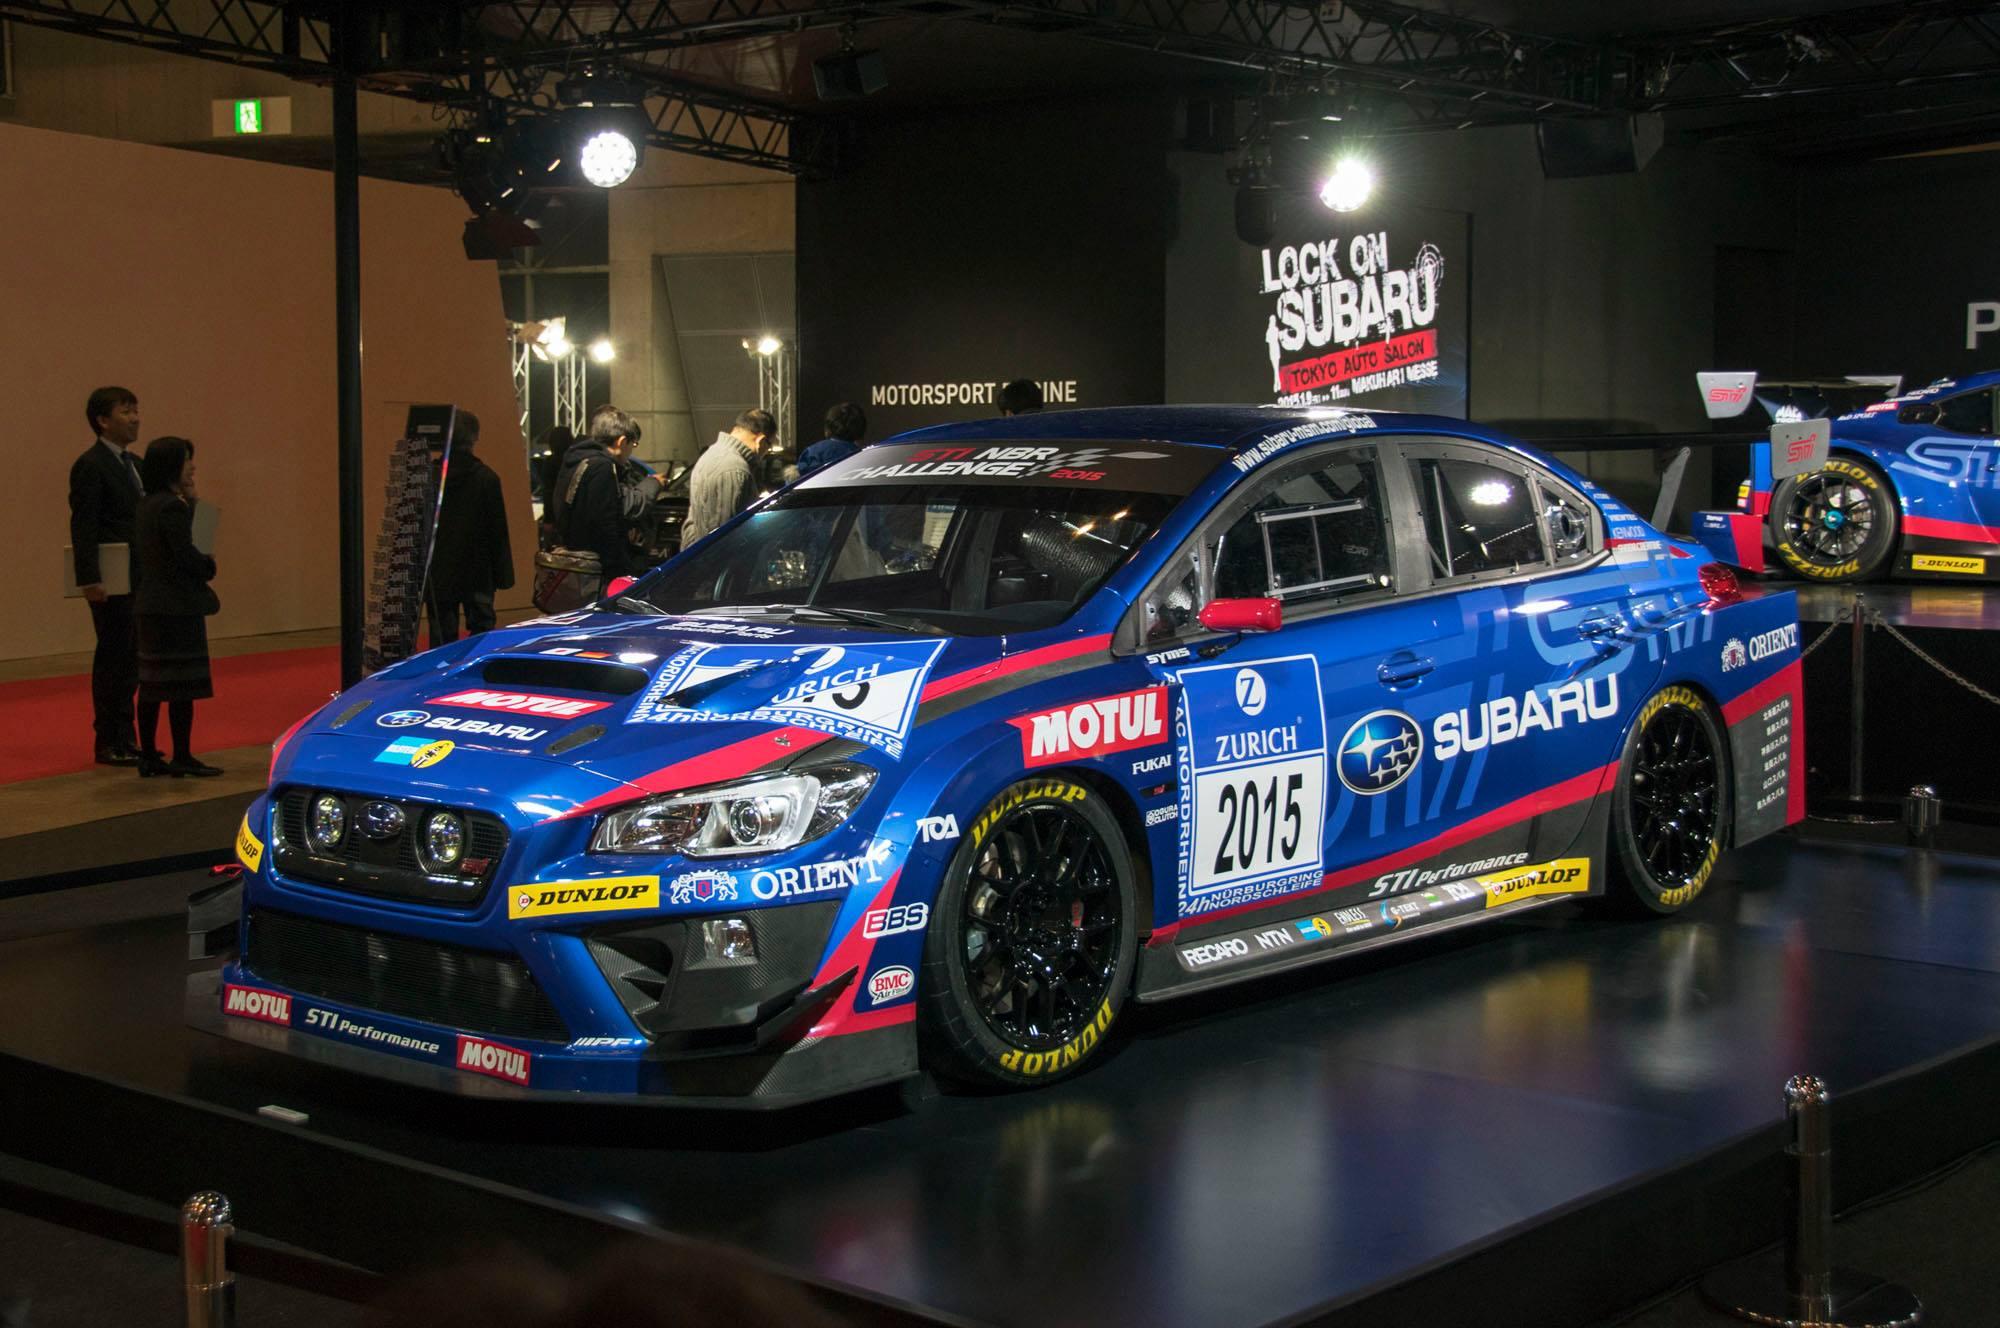 2015 Subaru Racers Revealed Wrx Sti For Nurburgring 24h And Brz Boxer Engine Diagram Gt300